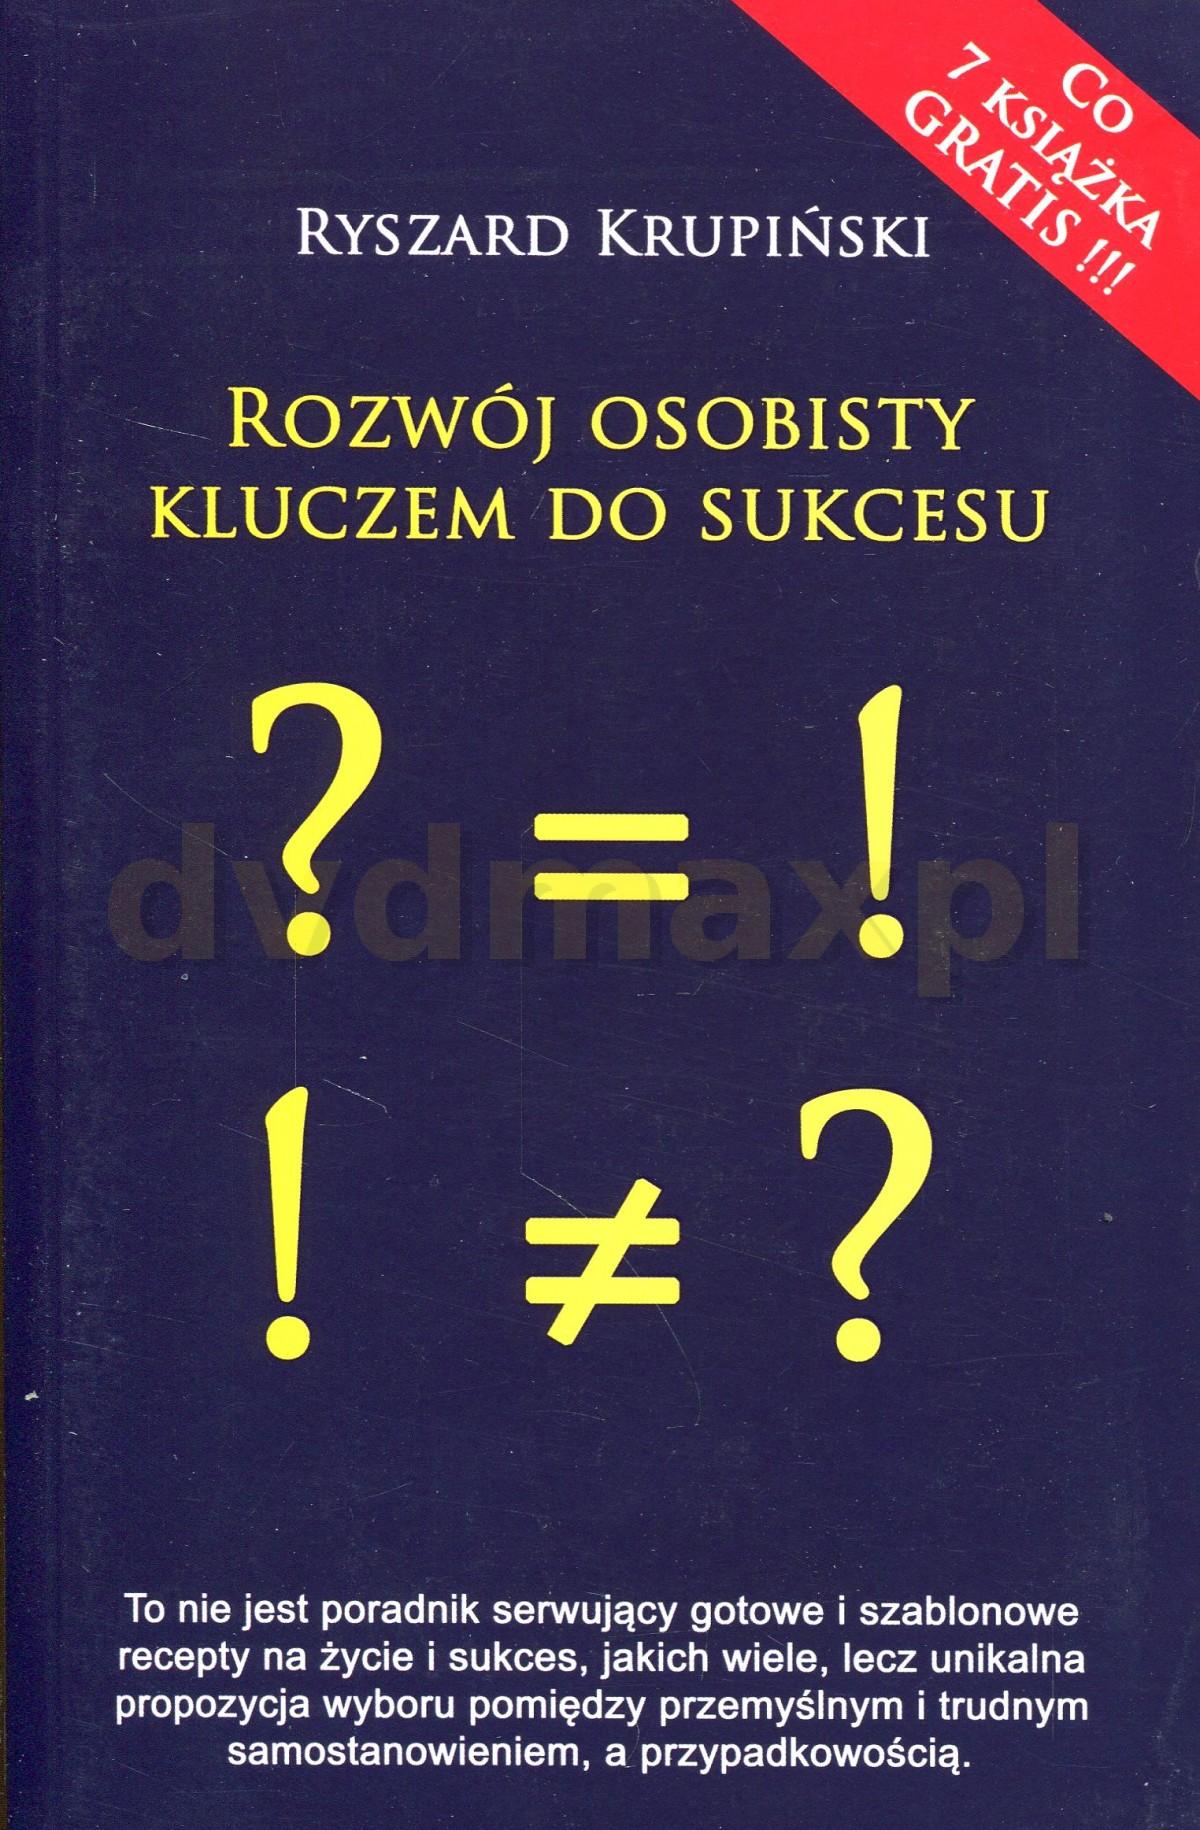 Rozwój osobisty kluczem do sukcesu - Ryszard Krupiński [KSIĄŻKA] - Ryszard Krupiński